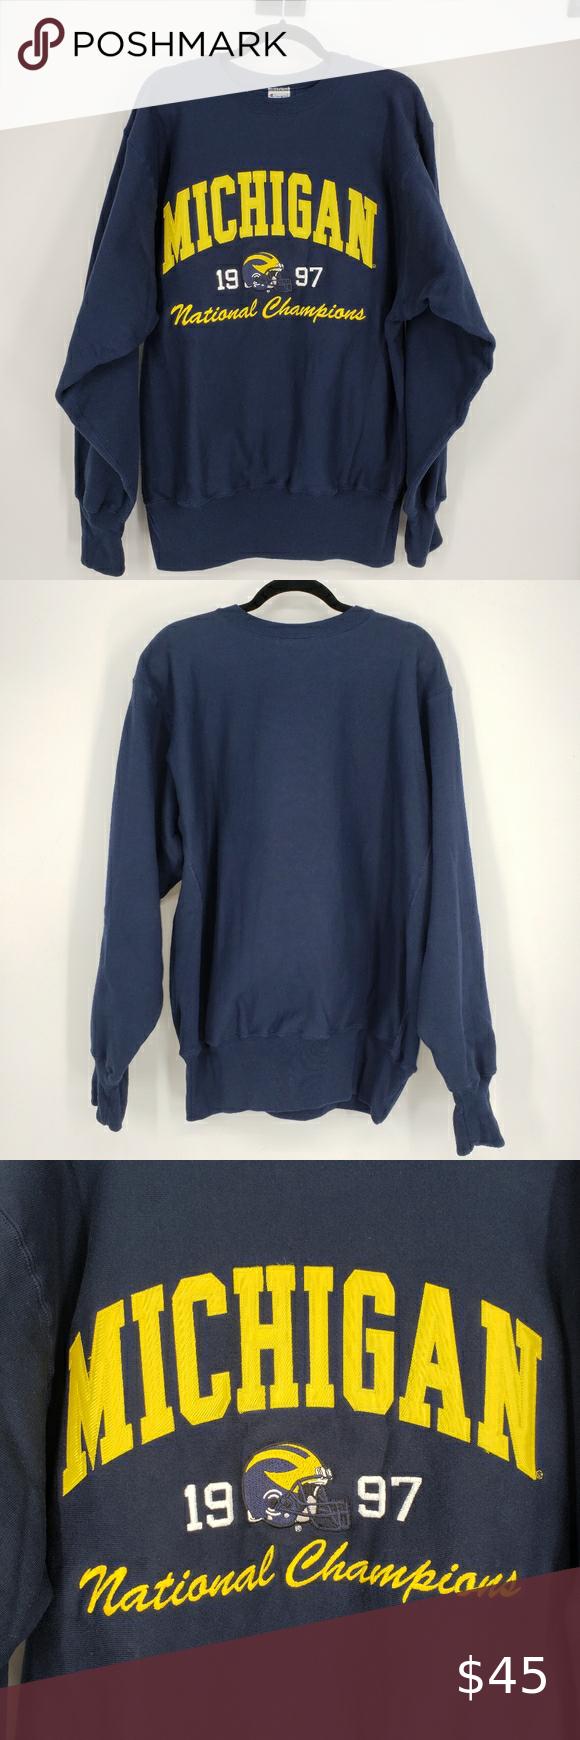 U Of M Vintage Reverse Weave Champion Sweatshirt Champion Sweatshirt Sweatshirts Sweatshirt Shirt [ 1740 x 580 Pixel ]